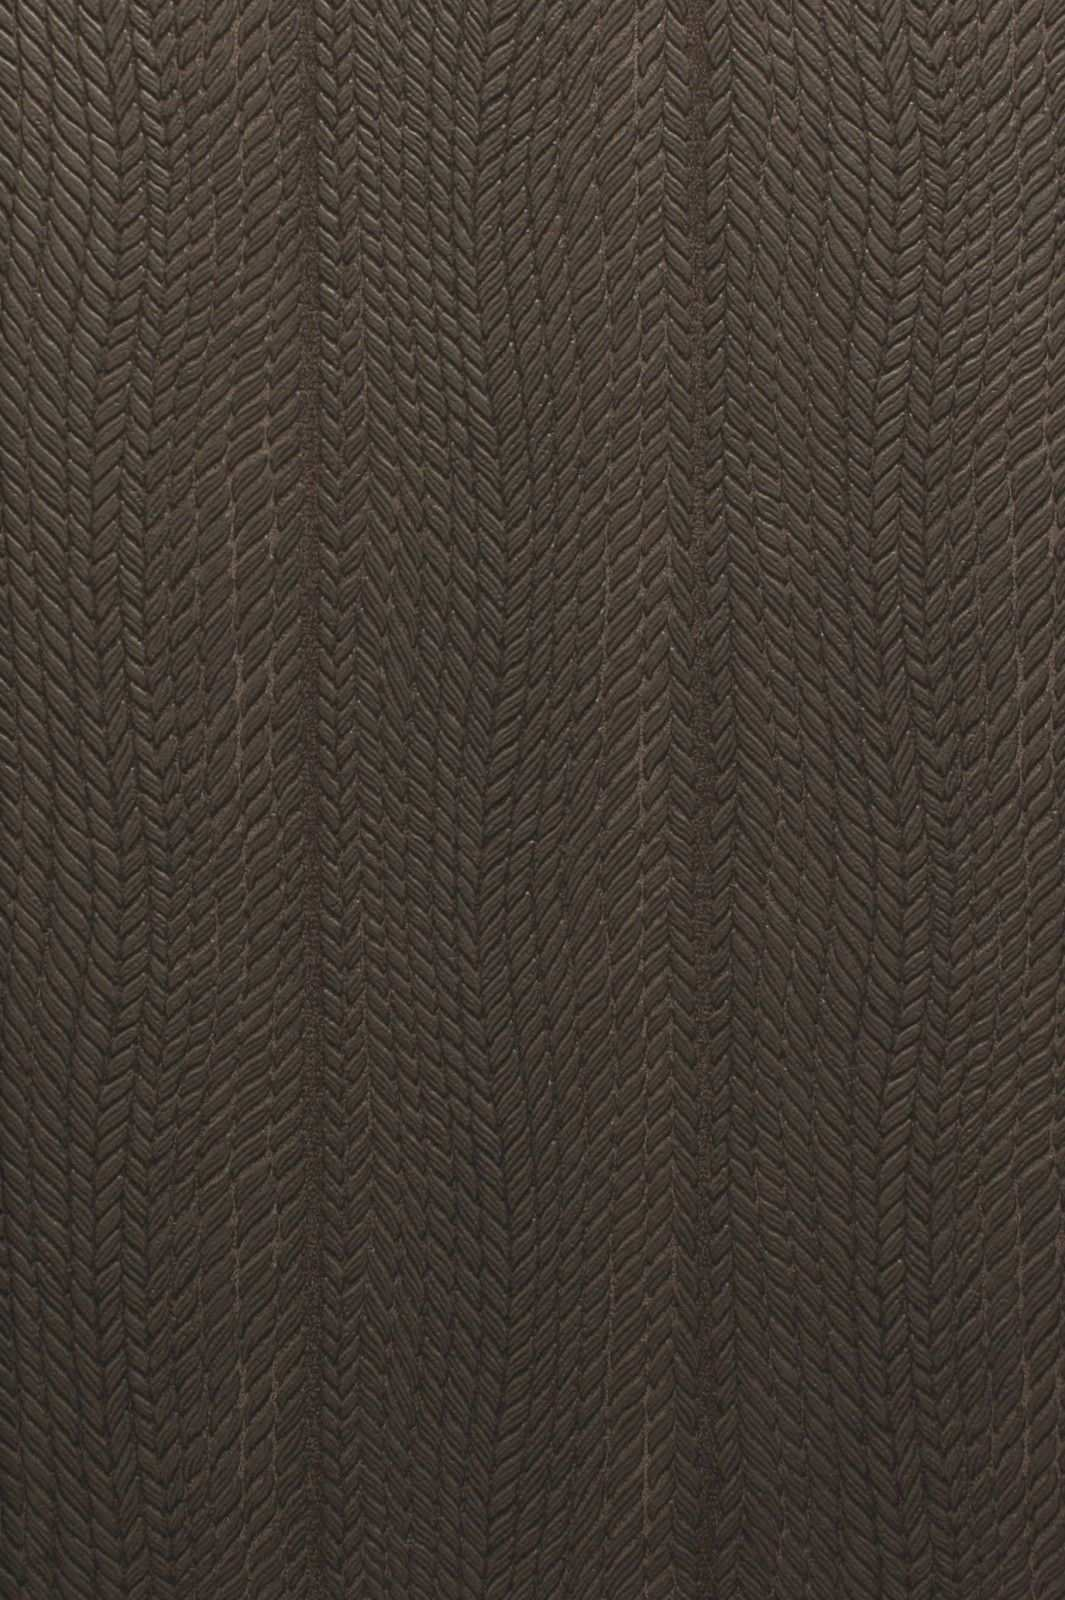 Vliestapete Barbara Becker Afrika Streifen Braun 452525 Tapeten Wandfarbe Vlies